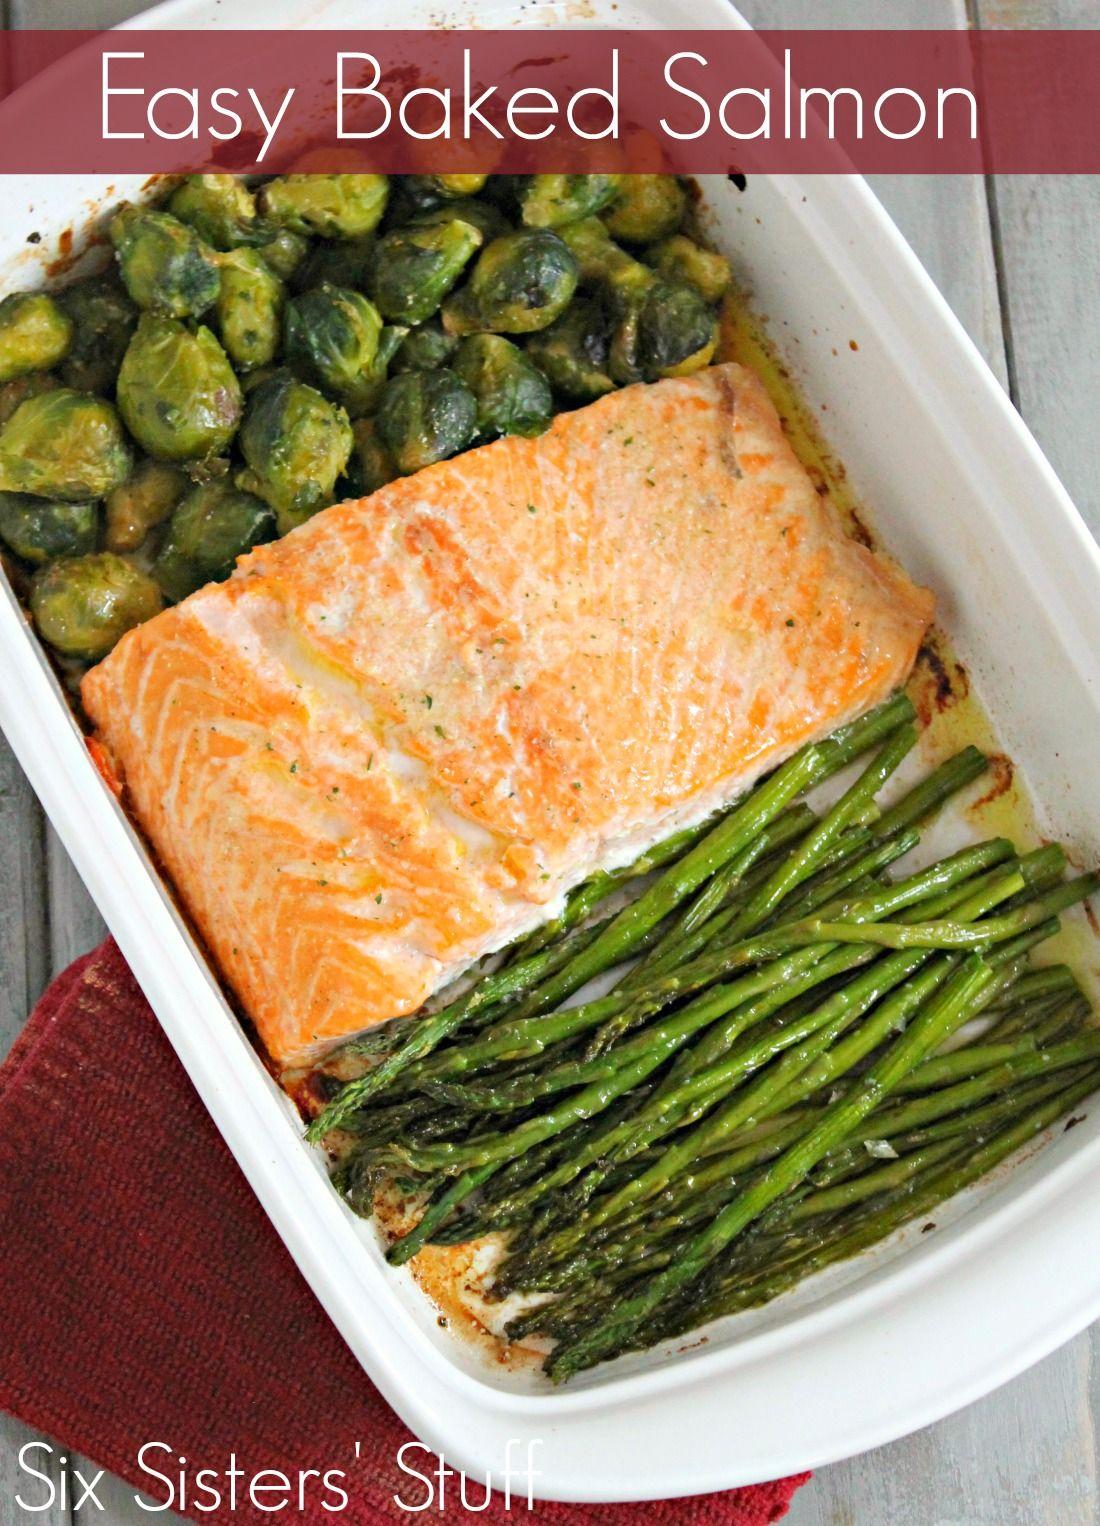 Easy Baked Salmon Recipe Salmon Recipes Food Recipes Baked Salmon